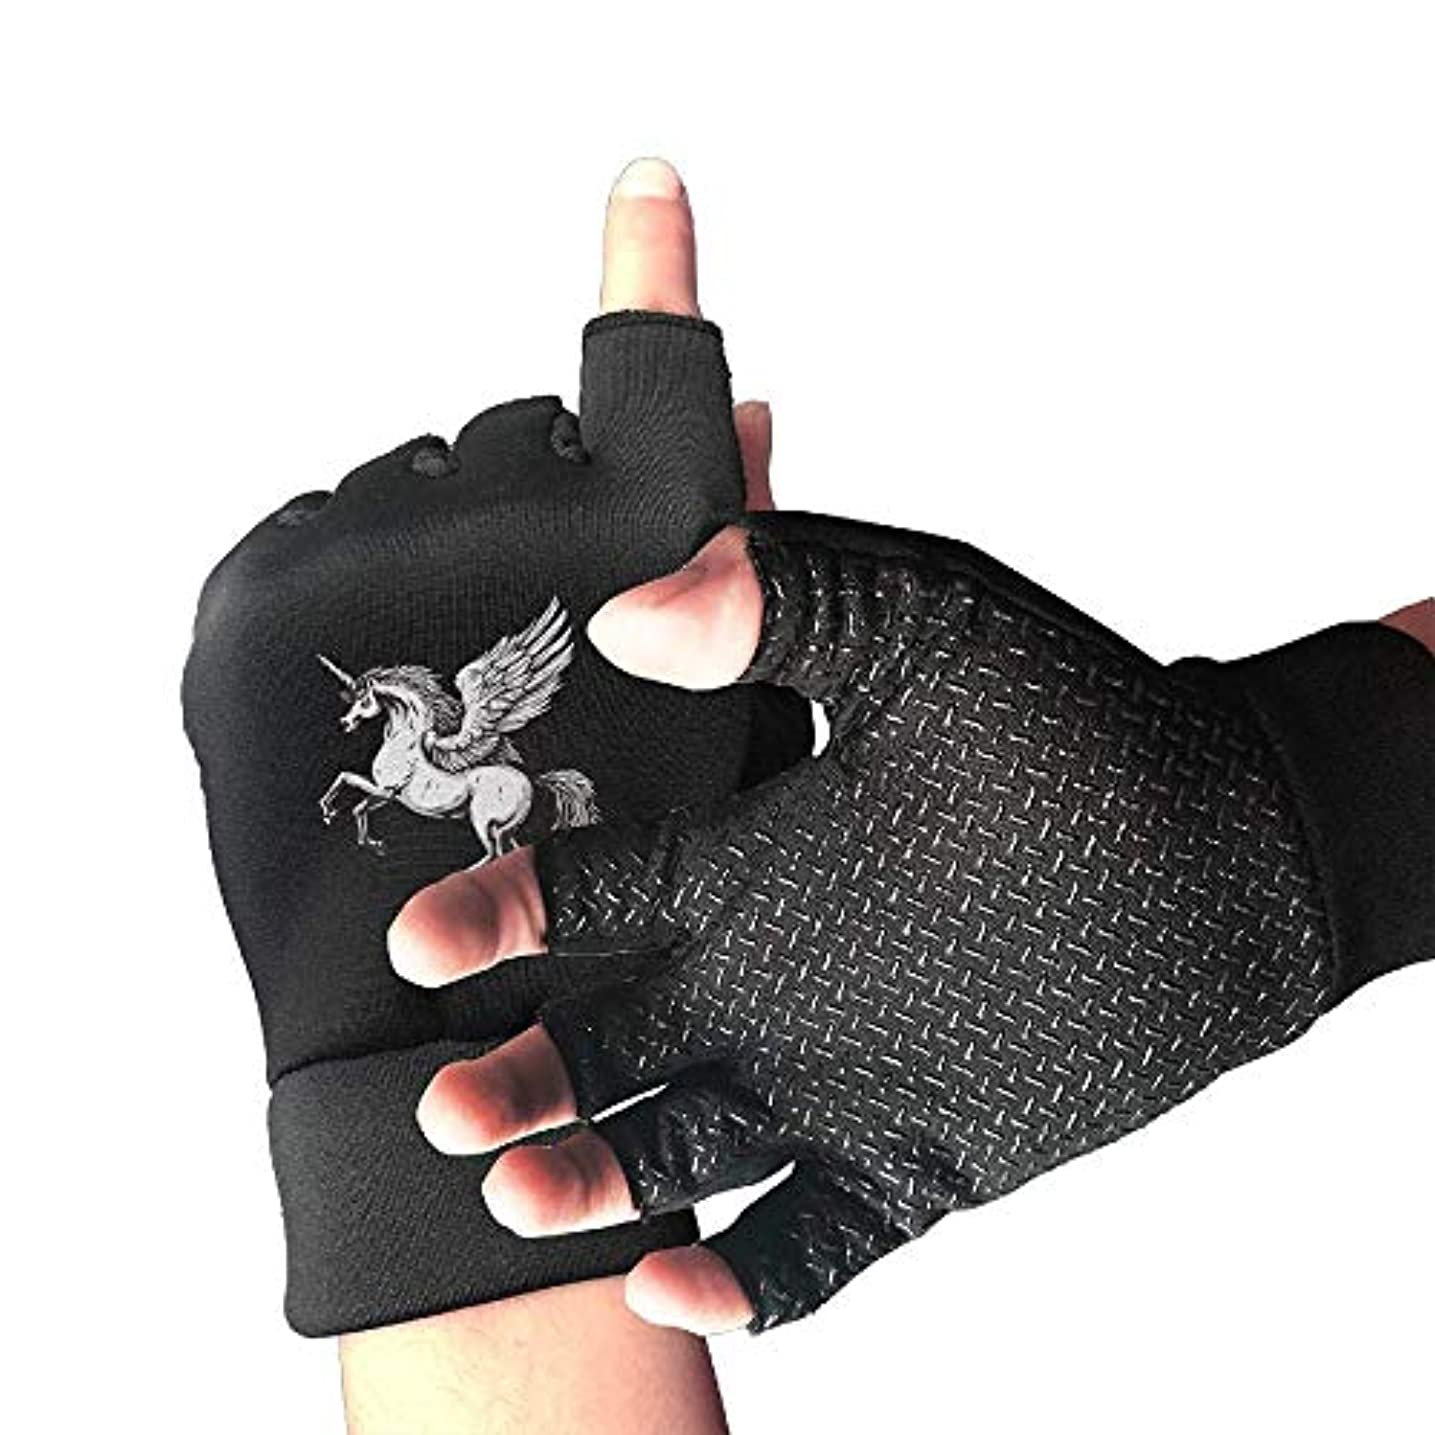 富豪治療人工Cycling Gloves Unicorn with Wings Men's/Women's Mountain Bike Gloves Half Finger Anti-Slip Motorcycle Gloves